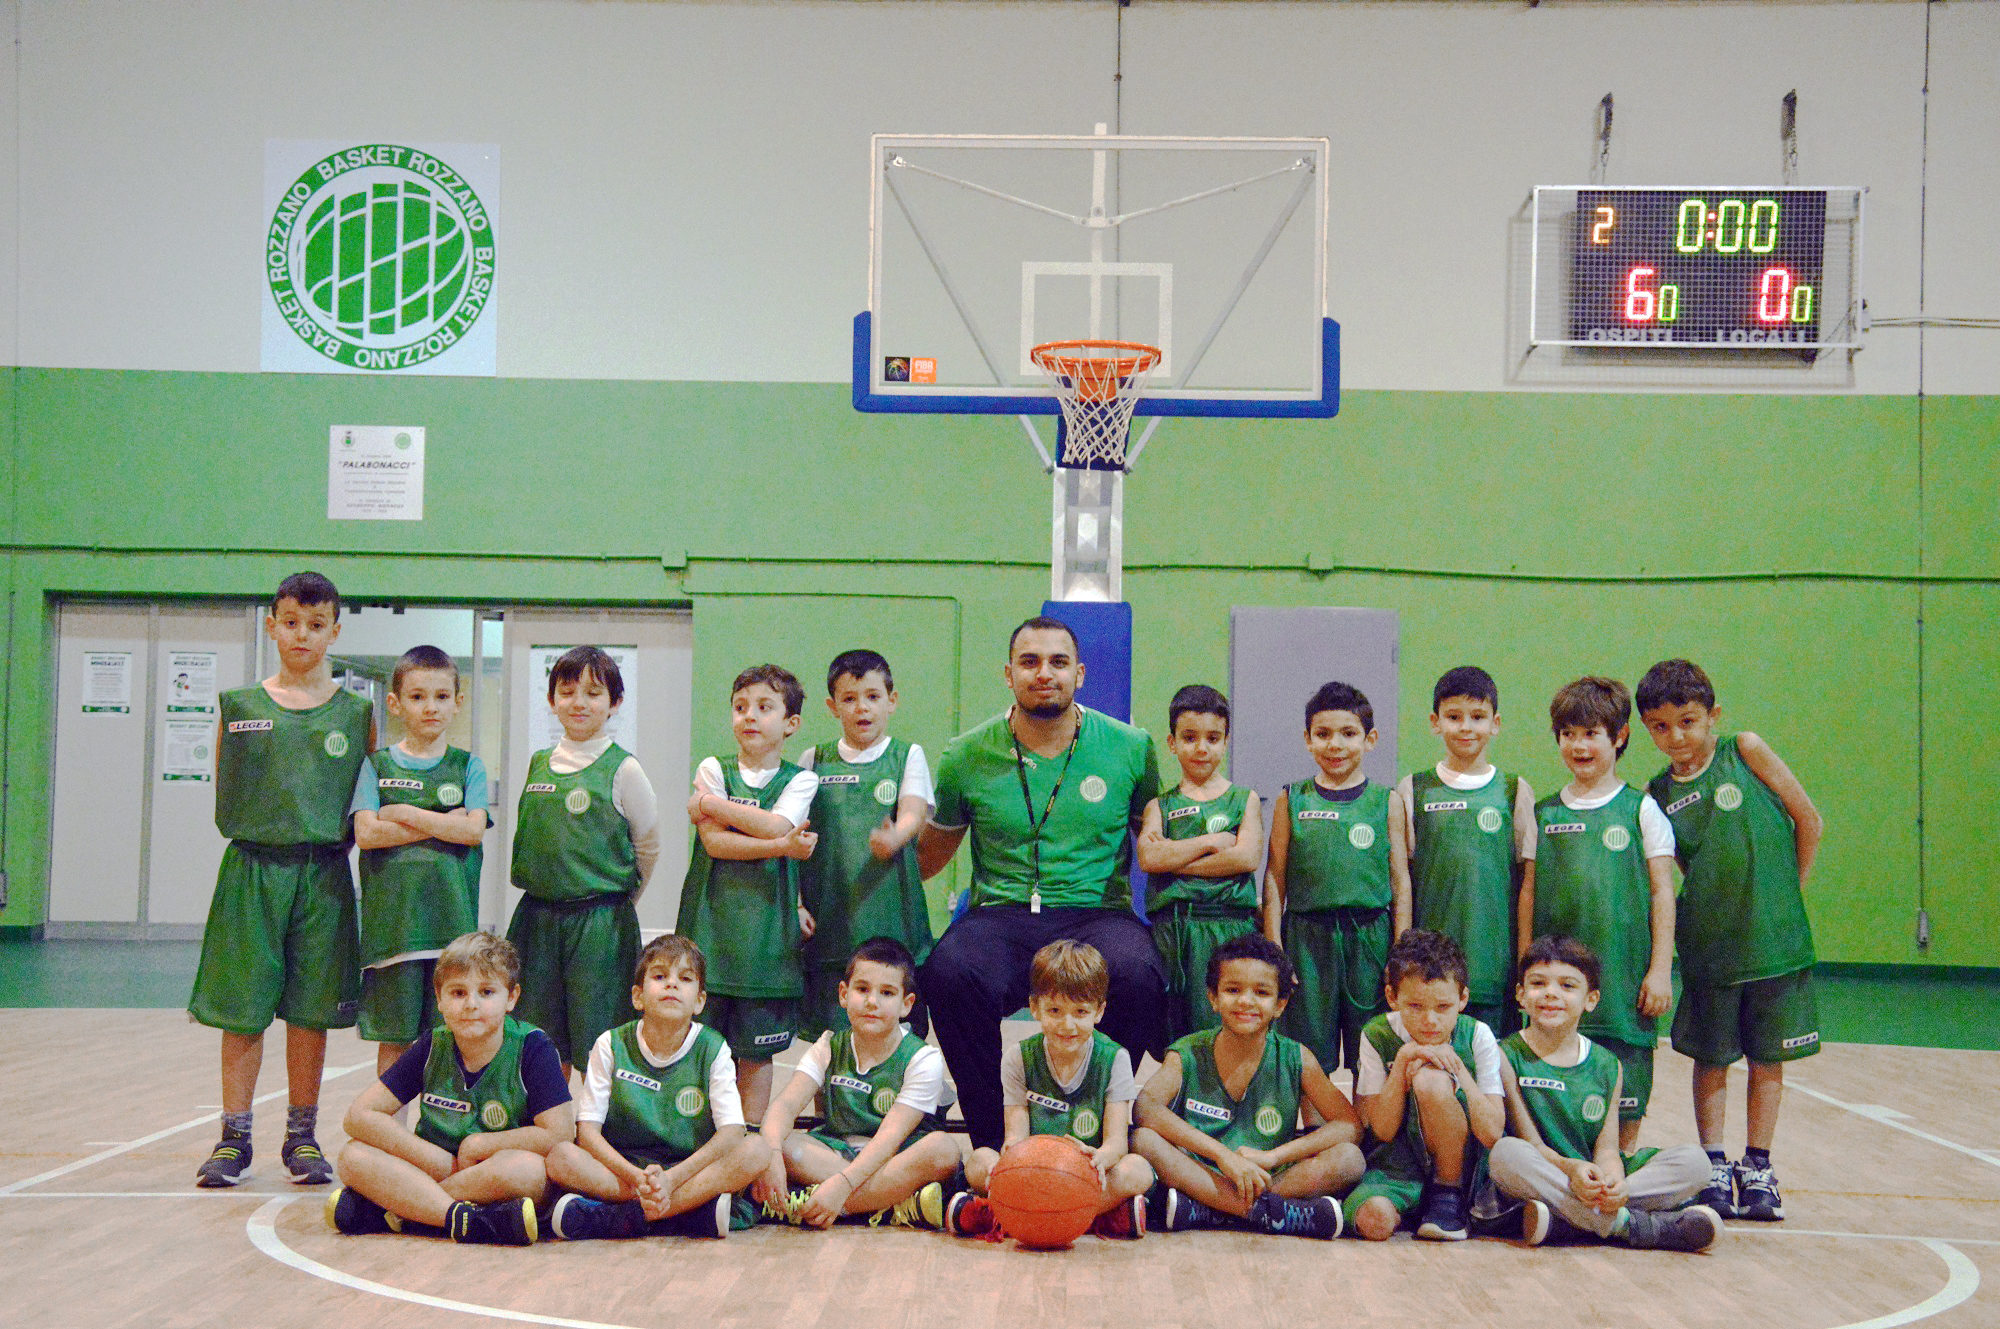 Scoiattoli-Team